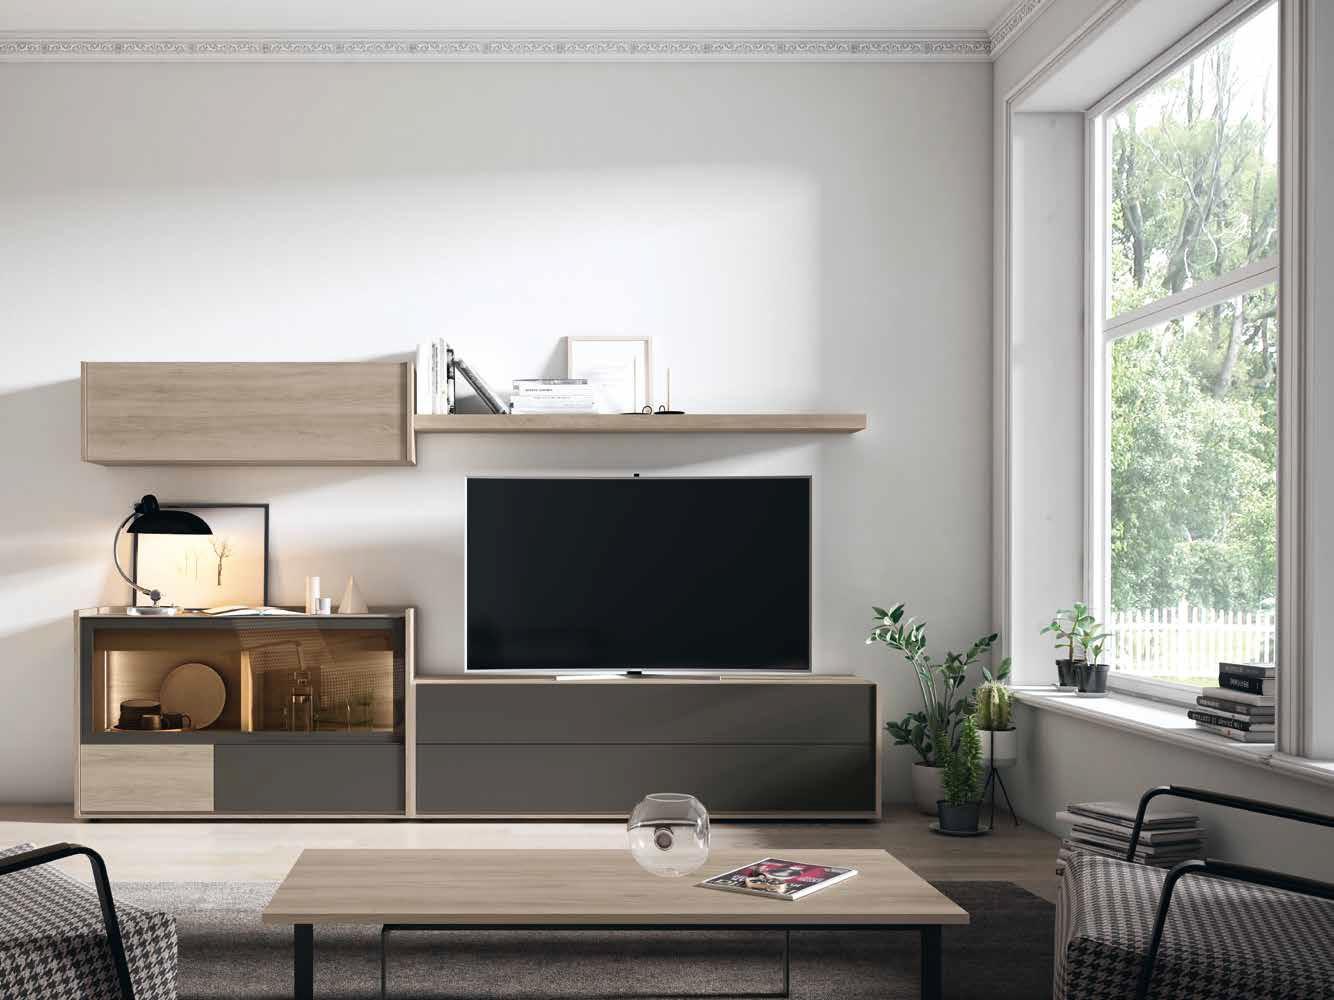 salon-moderno-Nativ-2019-muebles-paco-caballero-0920-5c8ceaa390fb3